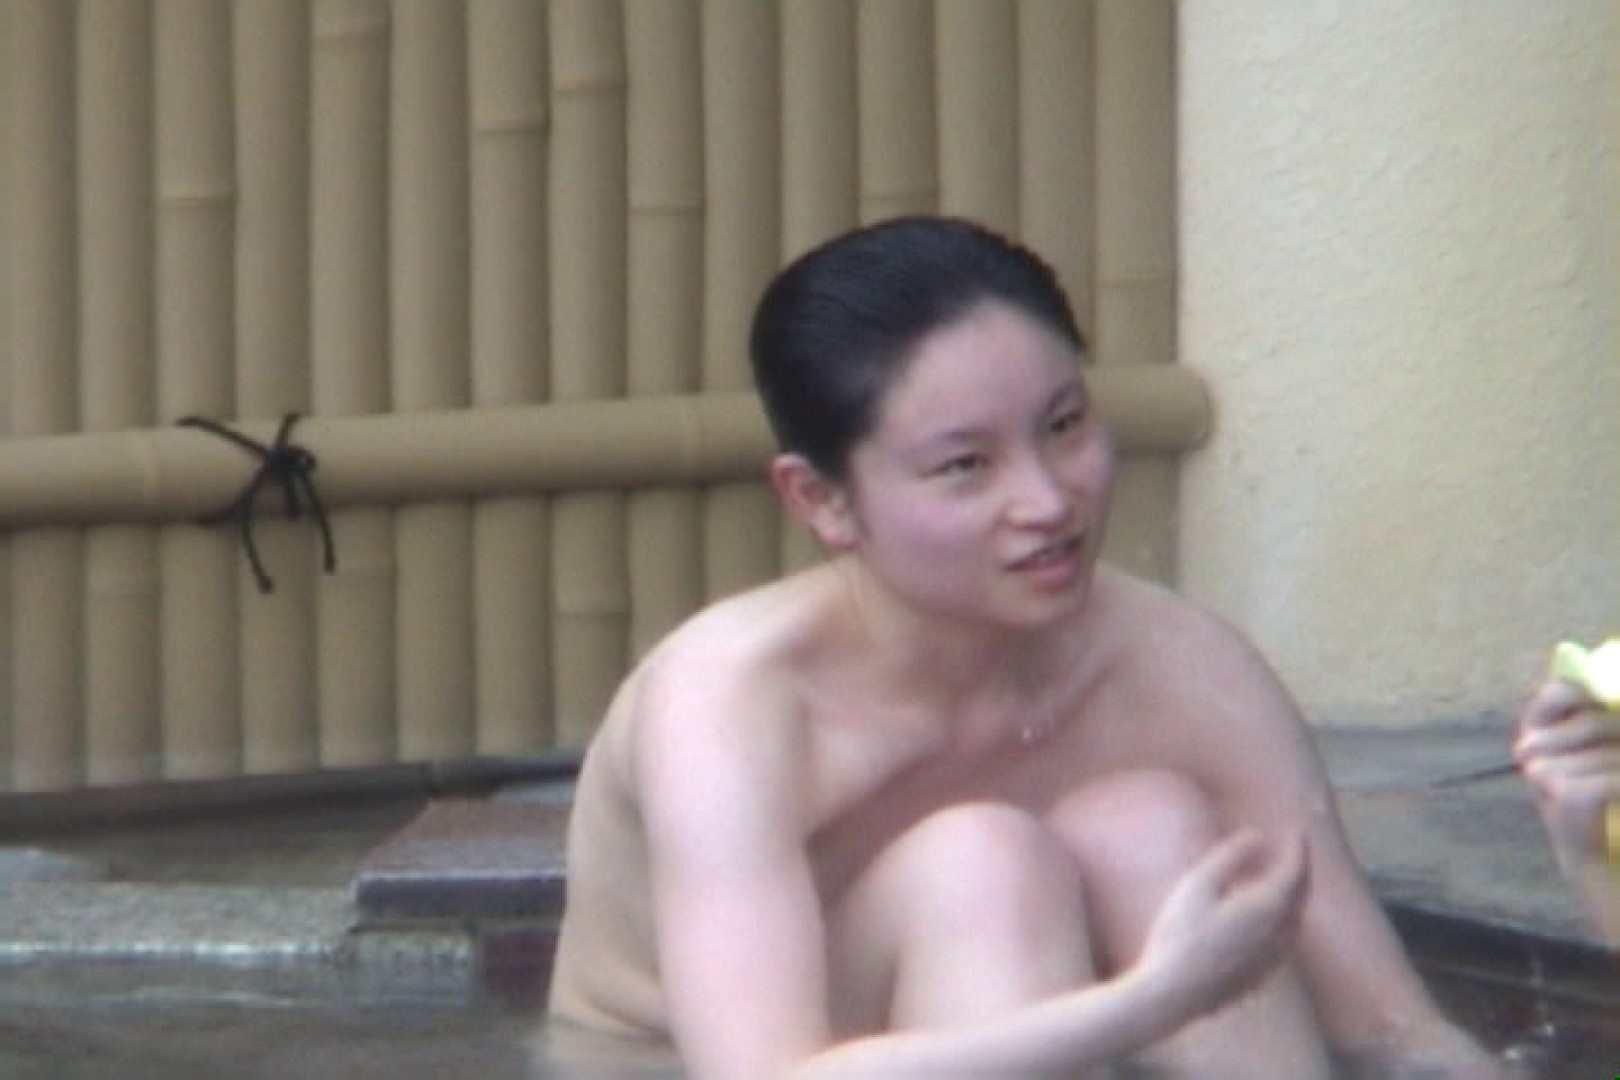 Aquaな露天風呂Vol.45【VIP限定】 HなOL   盗撮  100pic 43